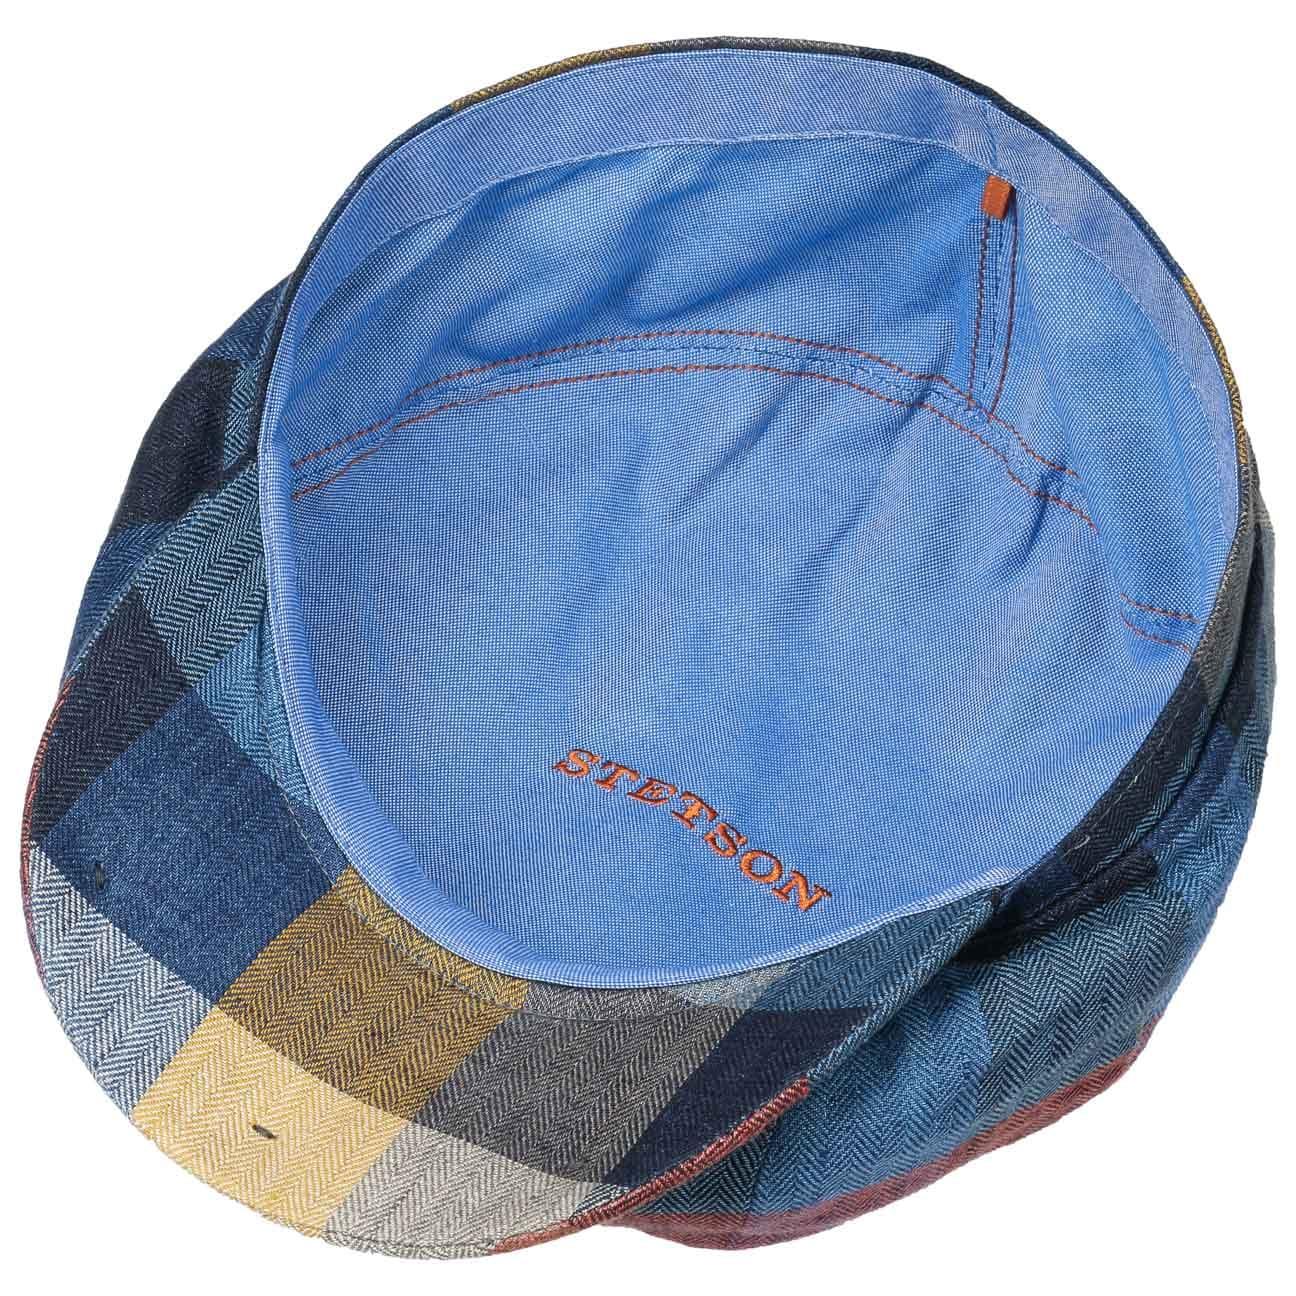 ... Hatteras Linen Check Flat Cap by Stetson - blue 3 ... c008e2b36ec0